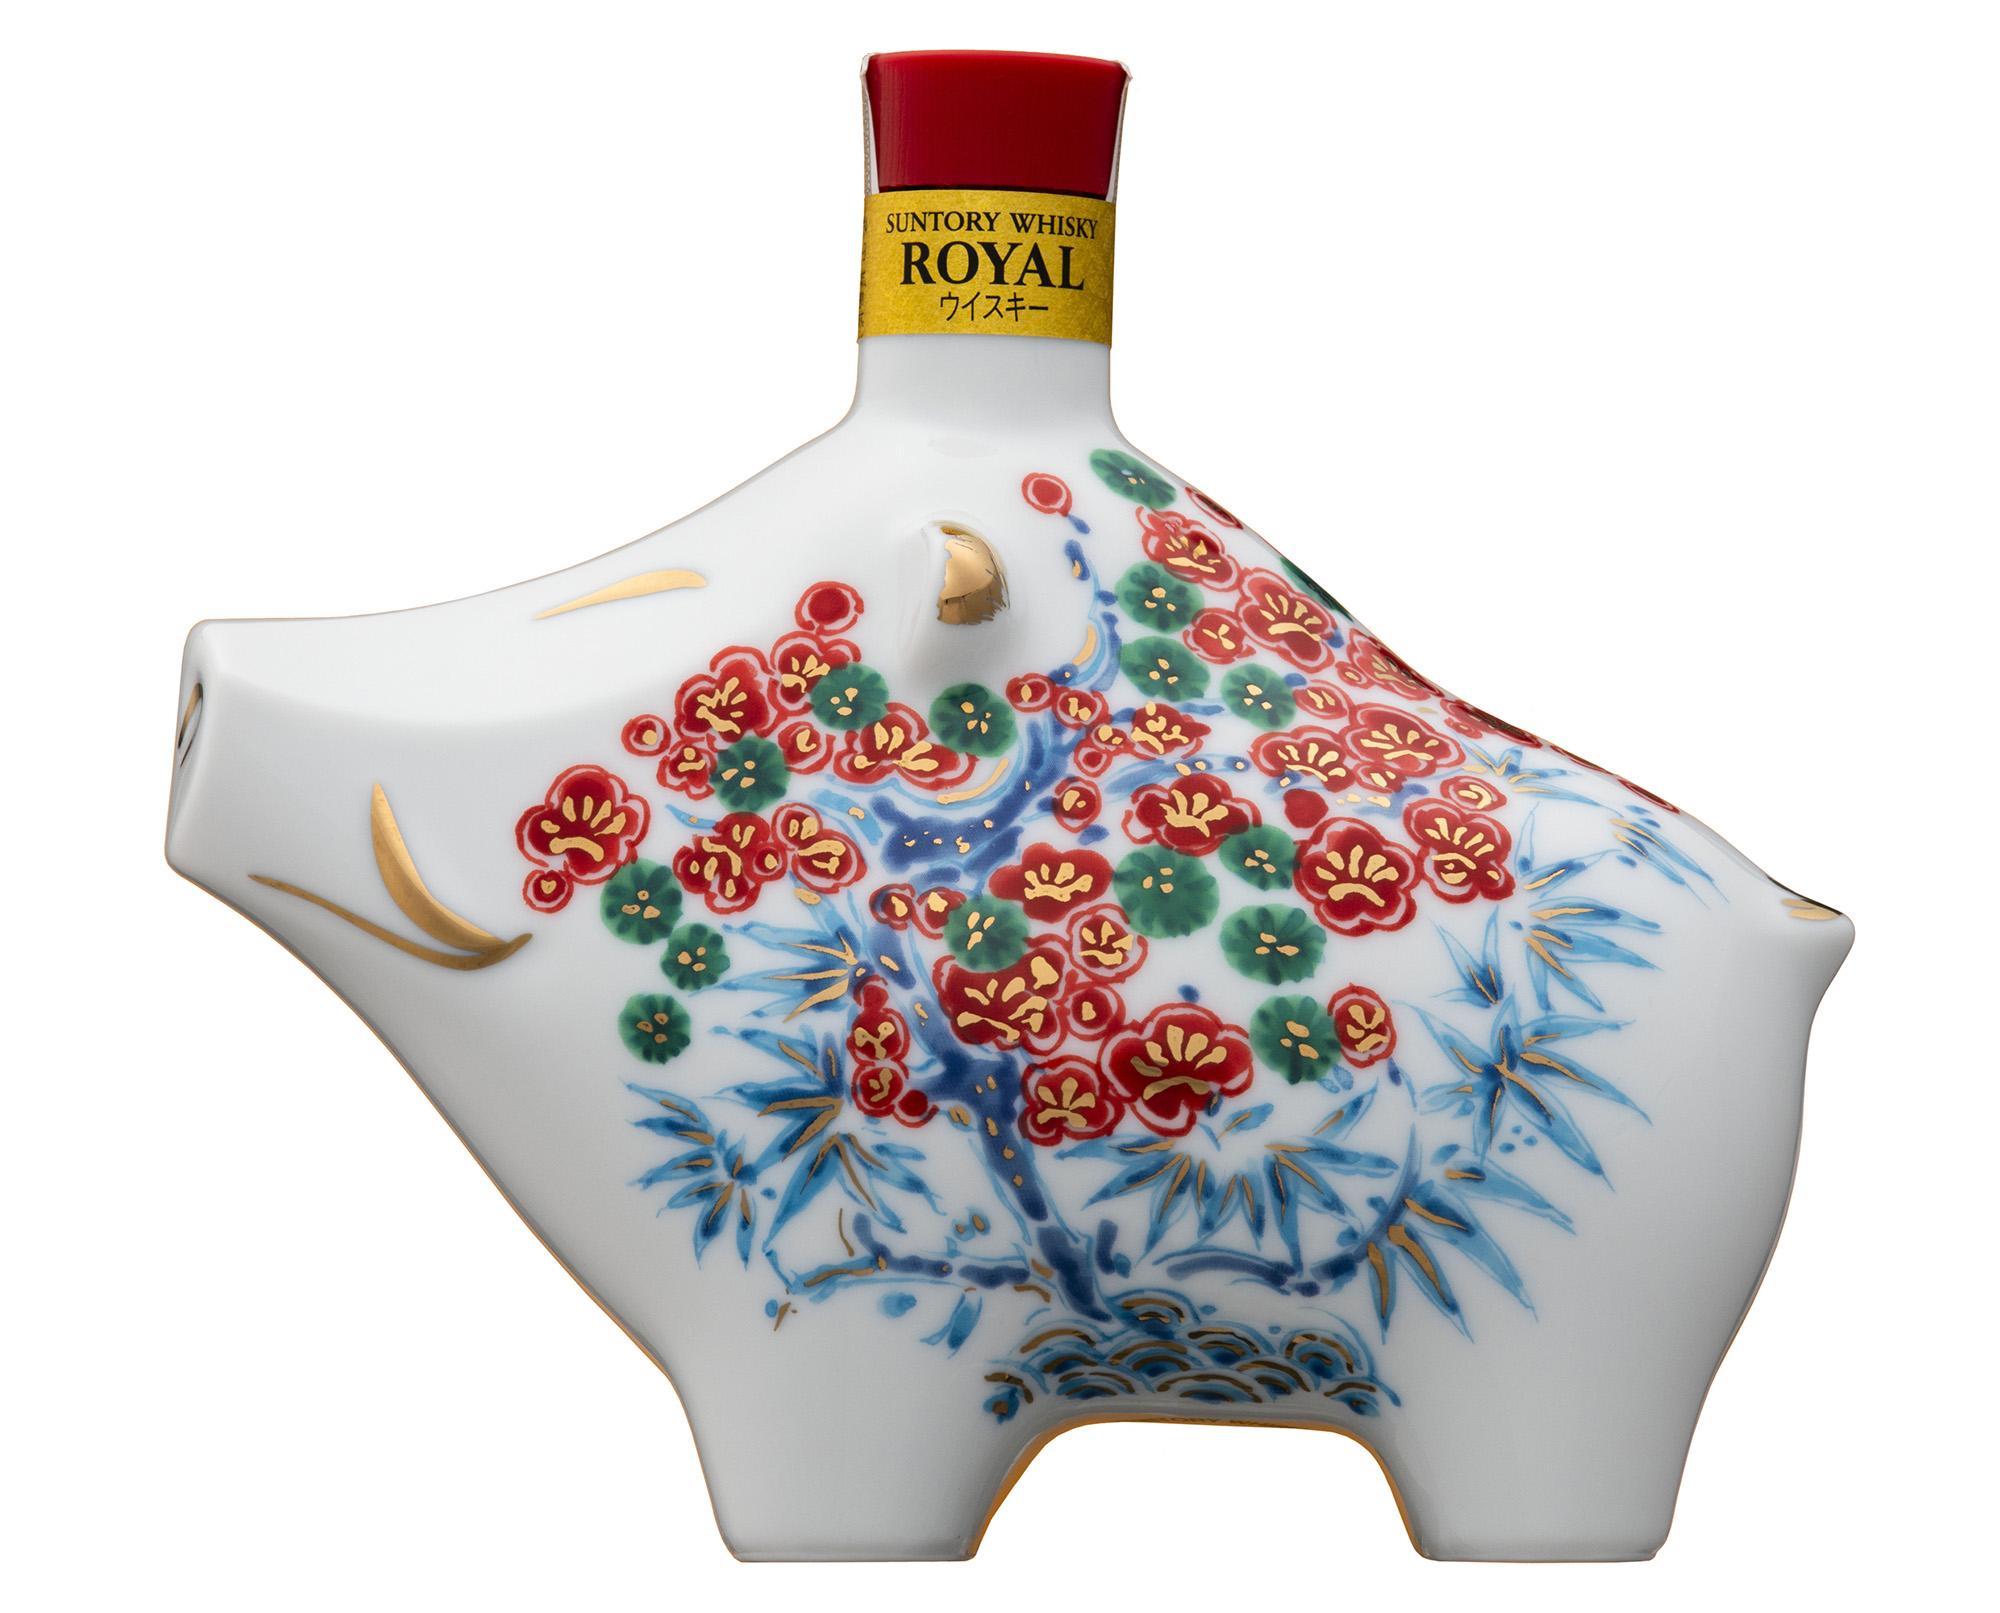 2019 Year of the Boar bottles of Suntory Whisky Royal, Suntory Old Whisky